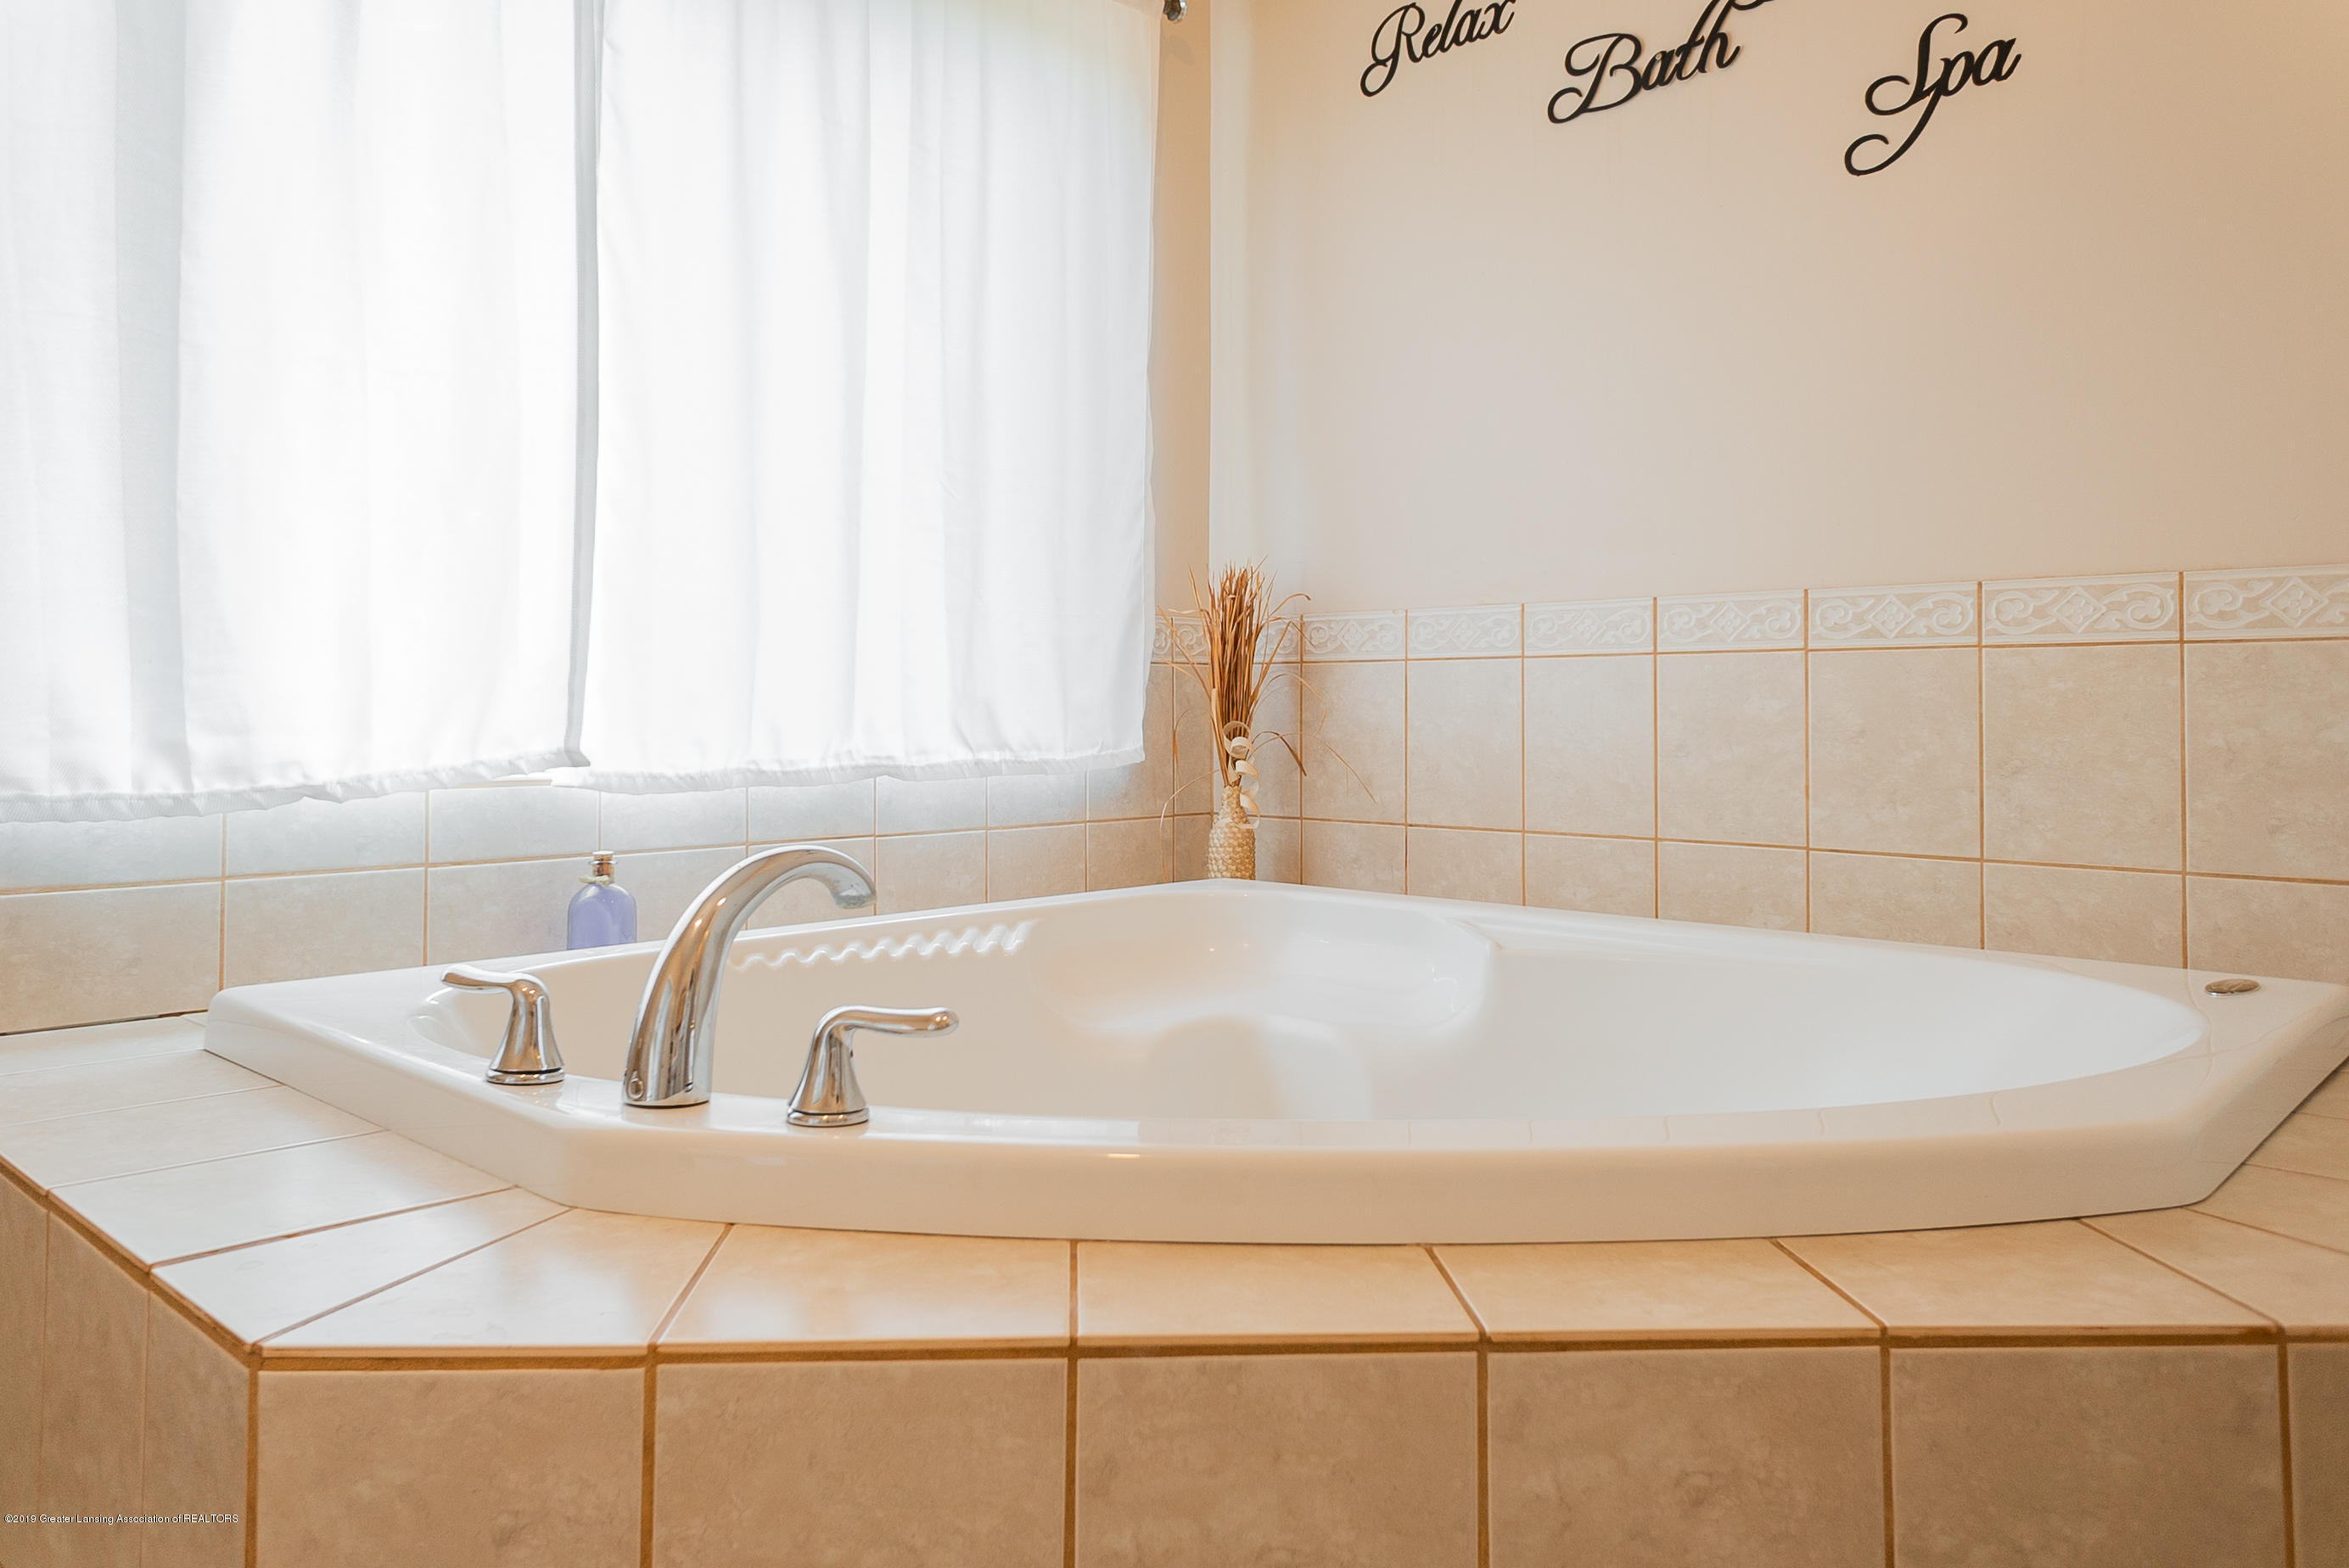 3220 Baseline Rd - Master Bathroom - 15